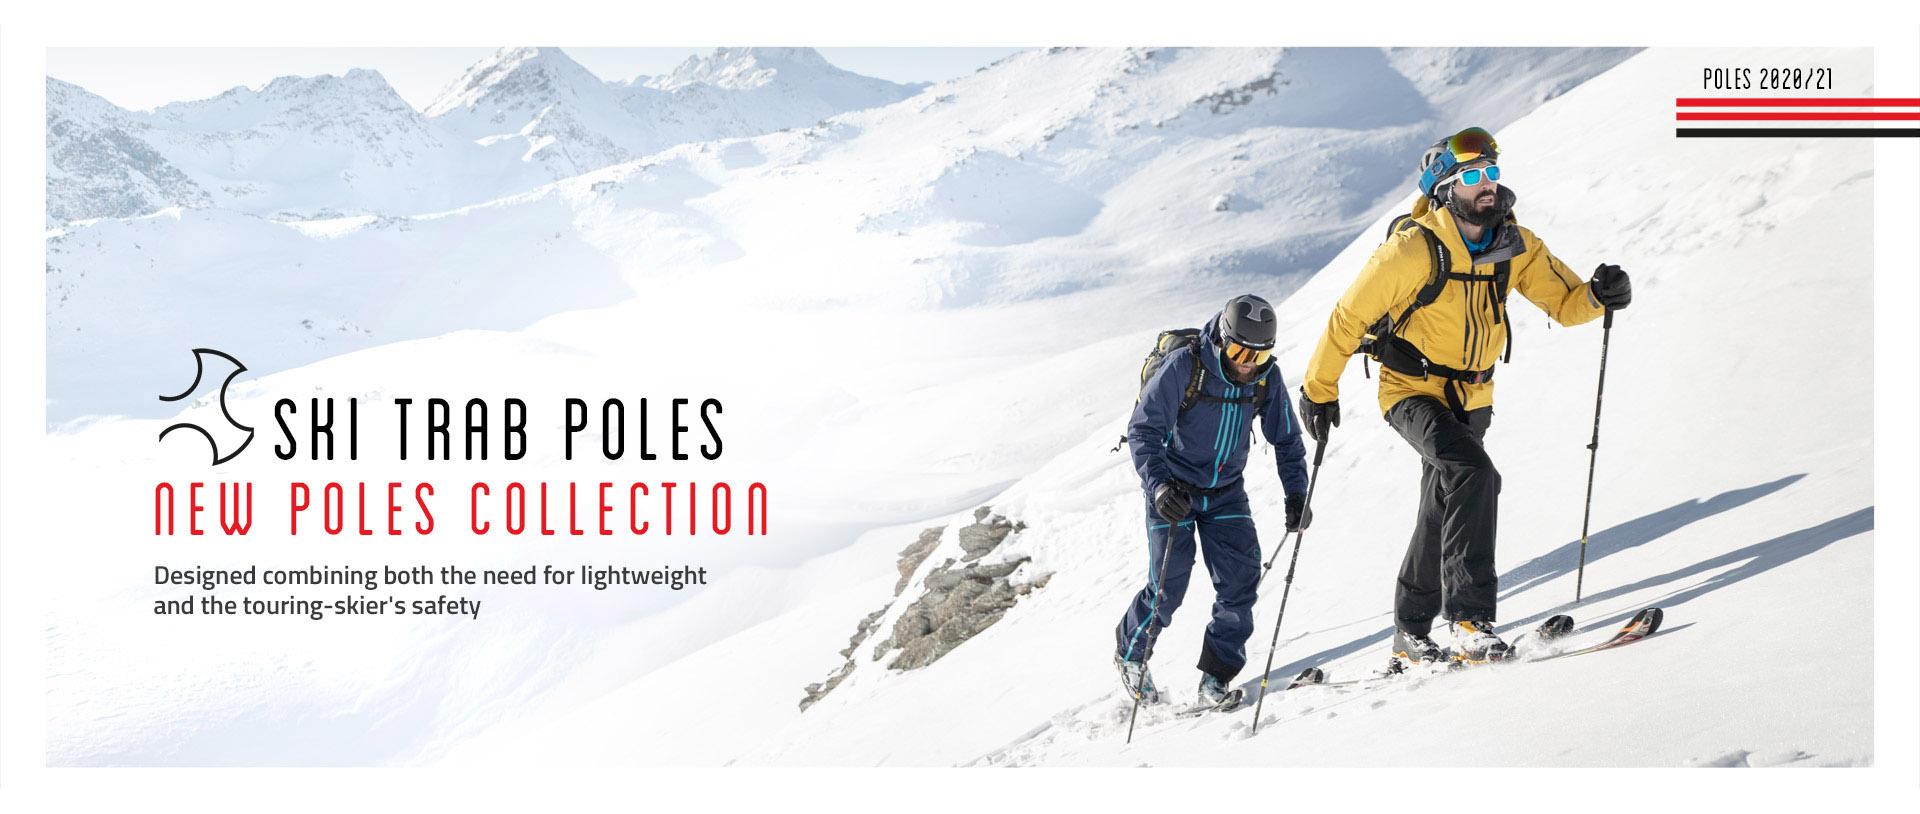 Poles Collection 2020/21 COM